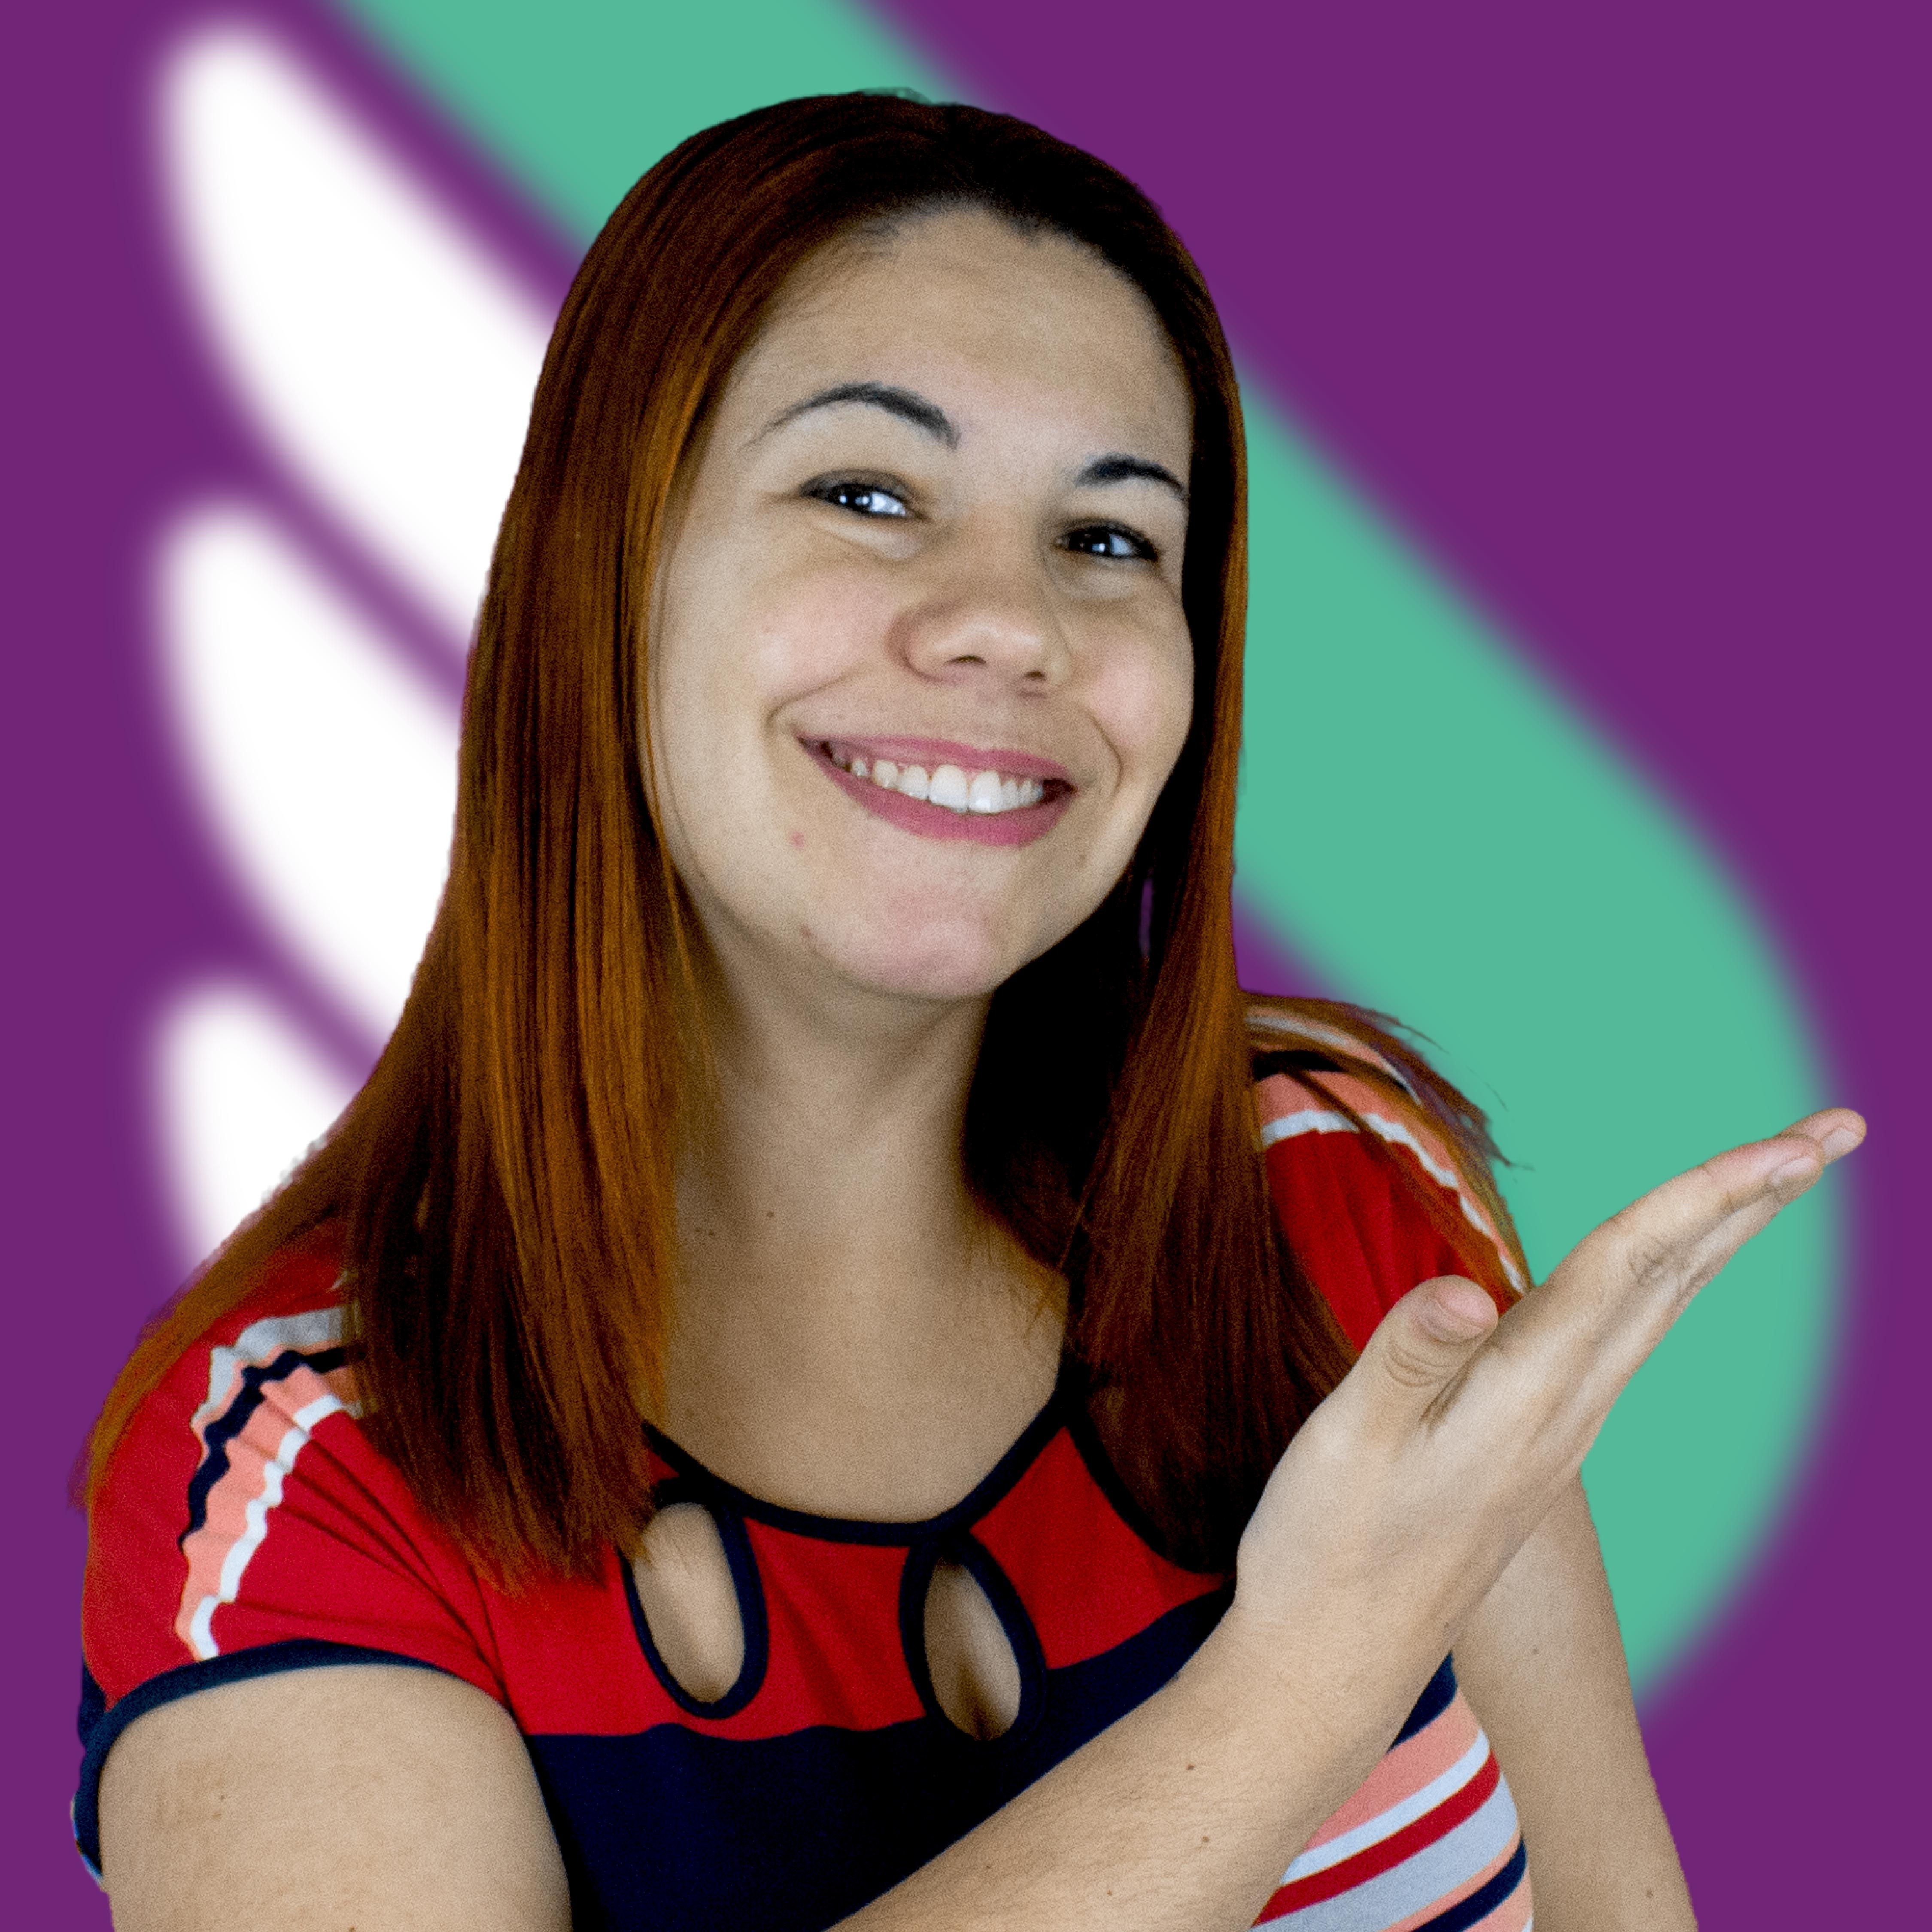 Professora Aline Vendrame Cordeiro